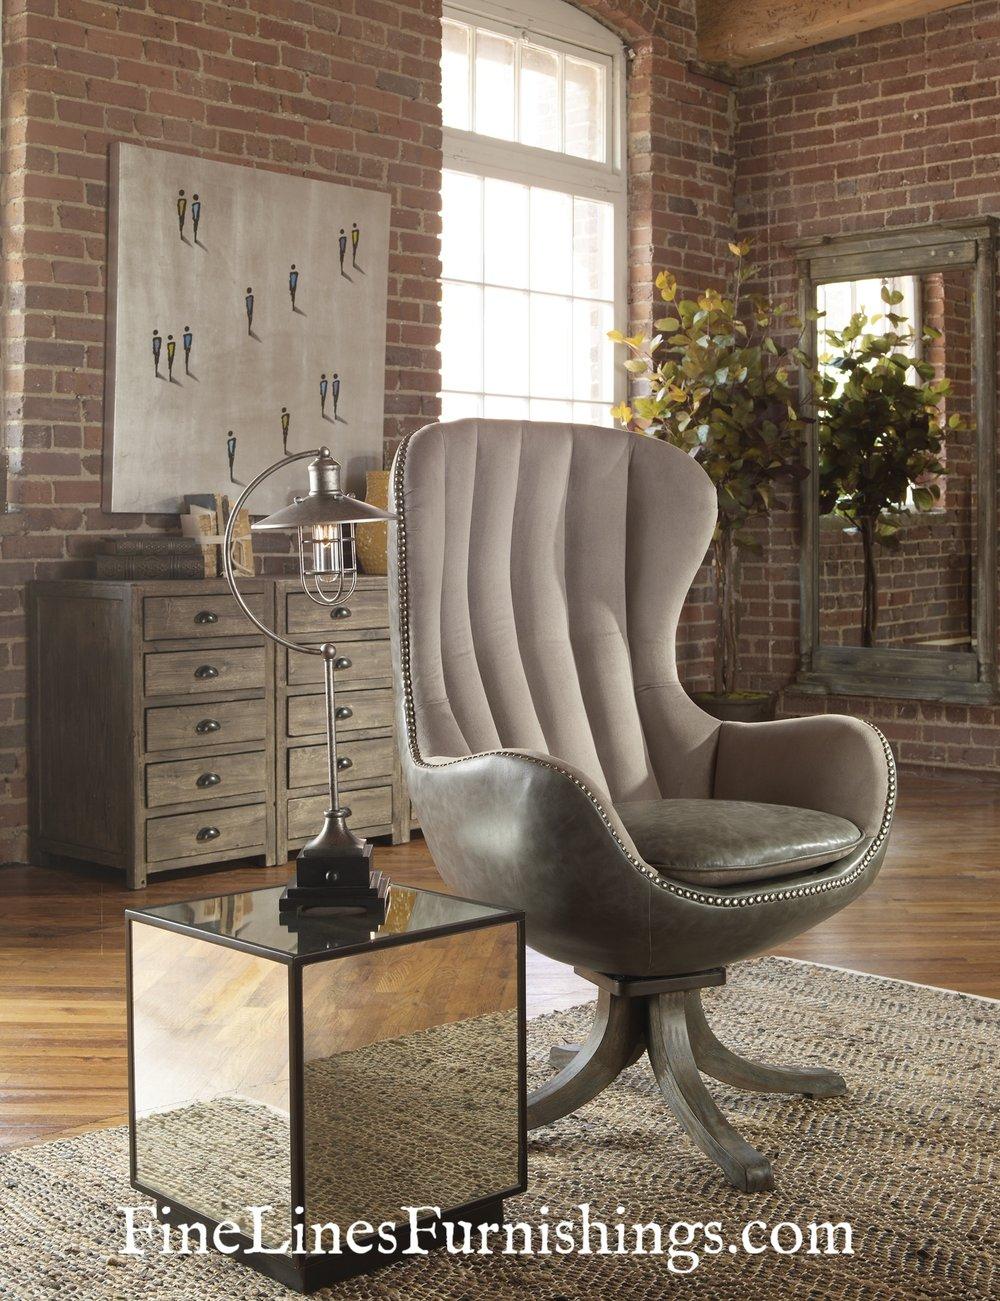 Furniture_tab.jpg